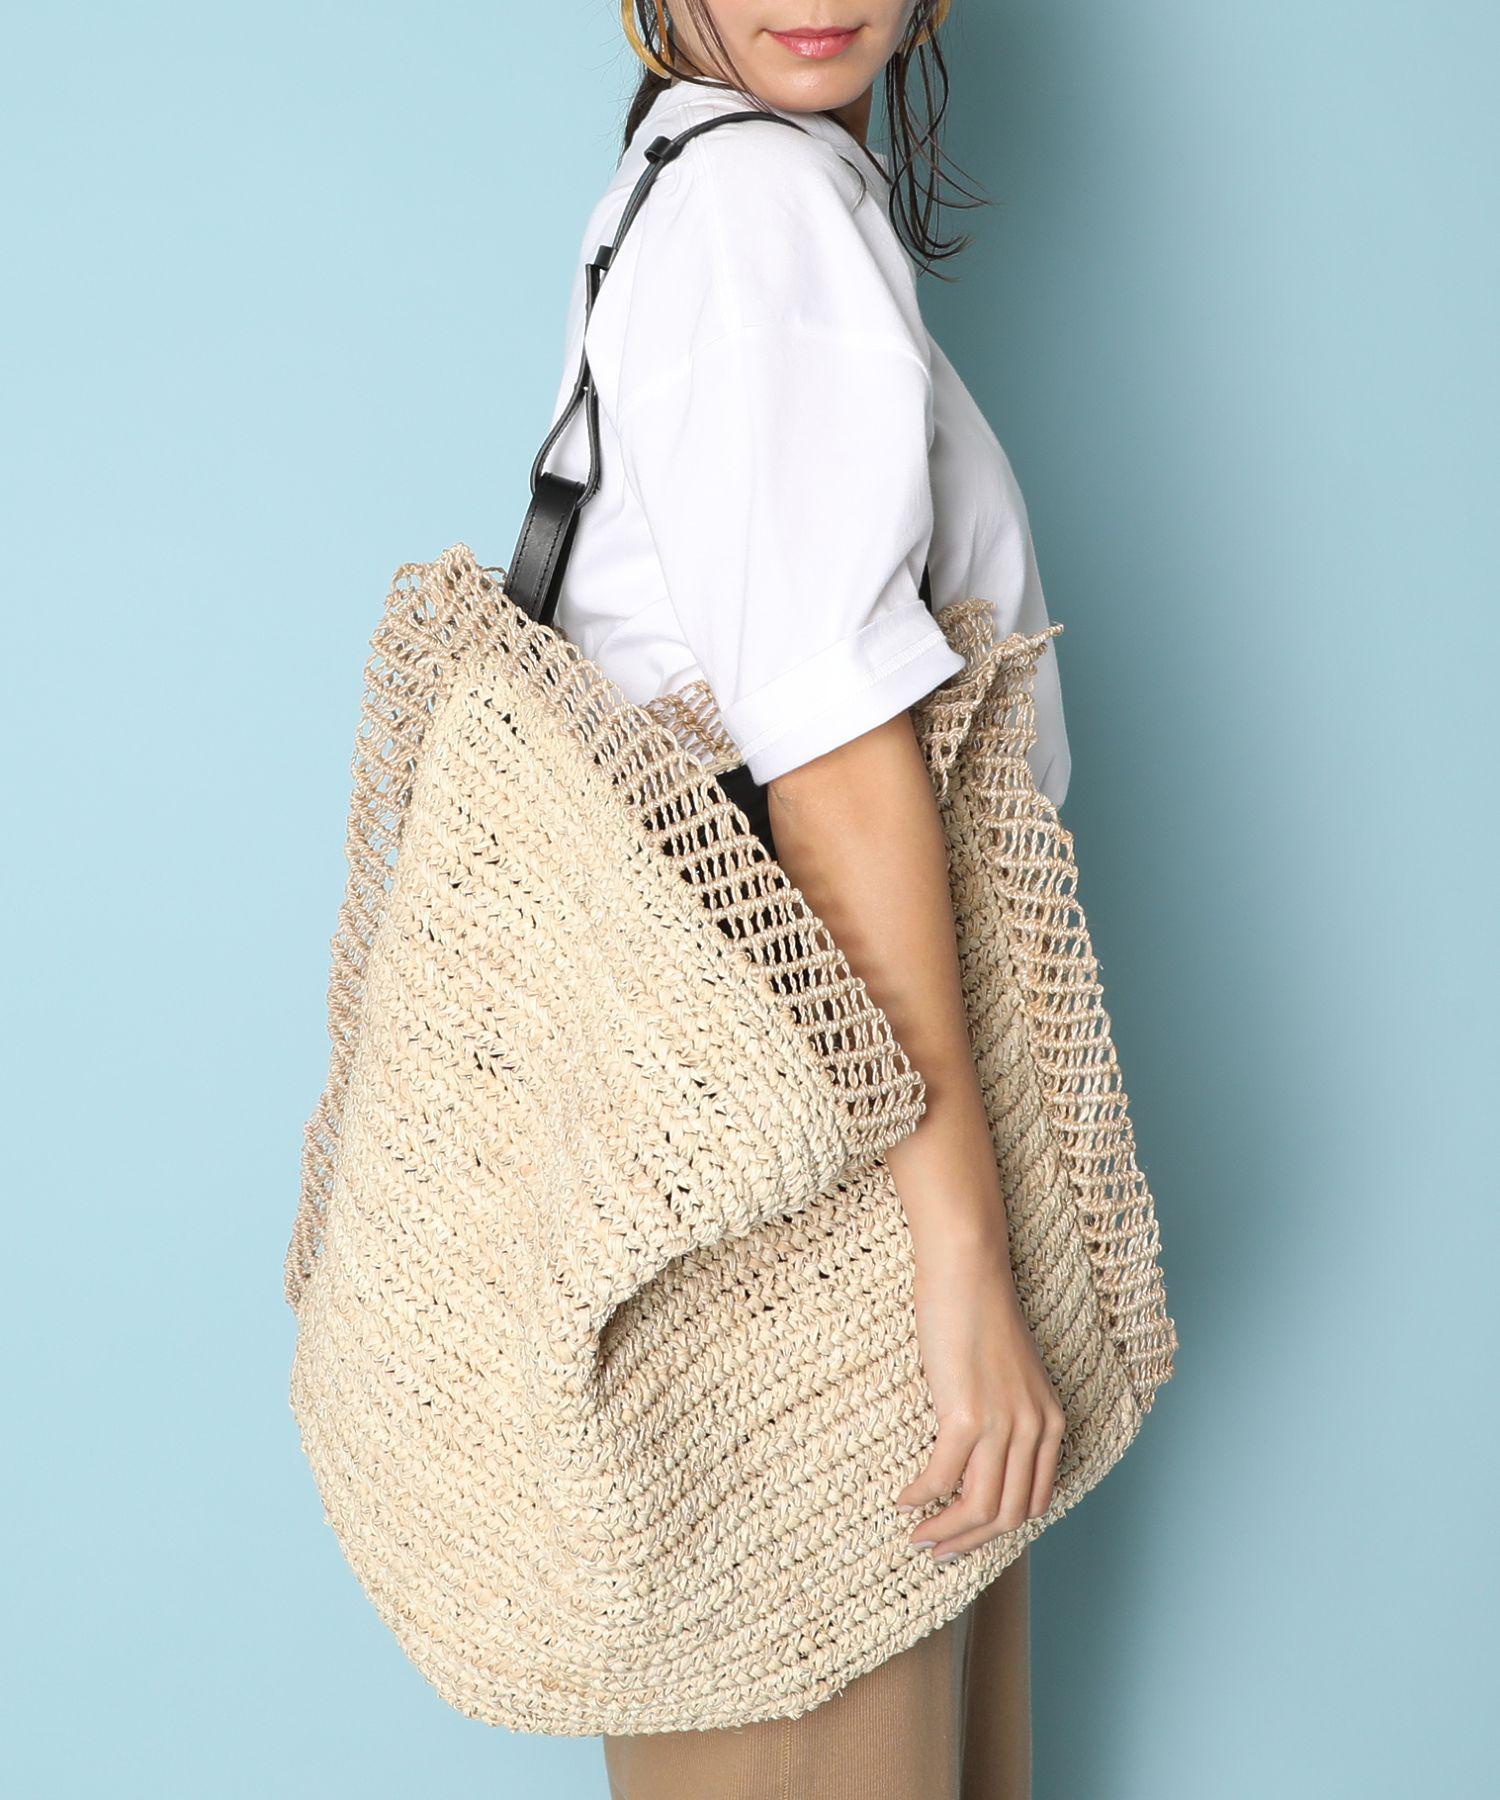 JAMIRAY ジャミレイ / ビッグラフィアトートバッグ Big Raffia Wear Bag